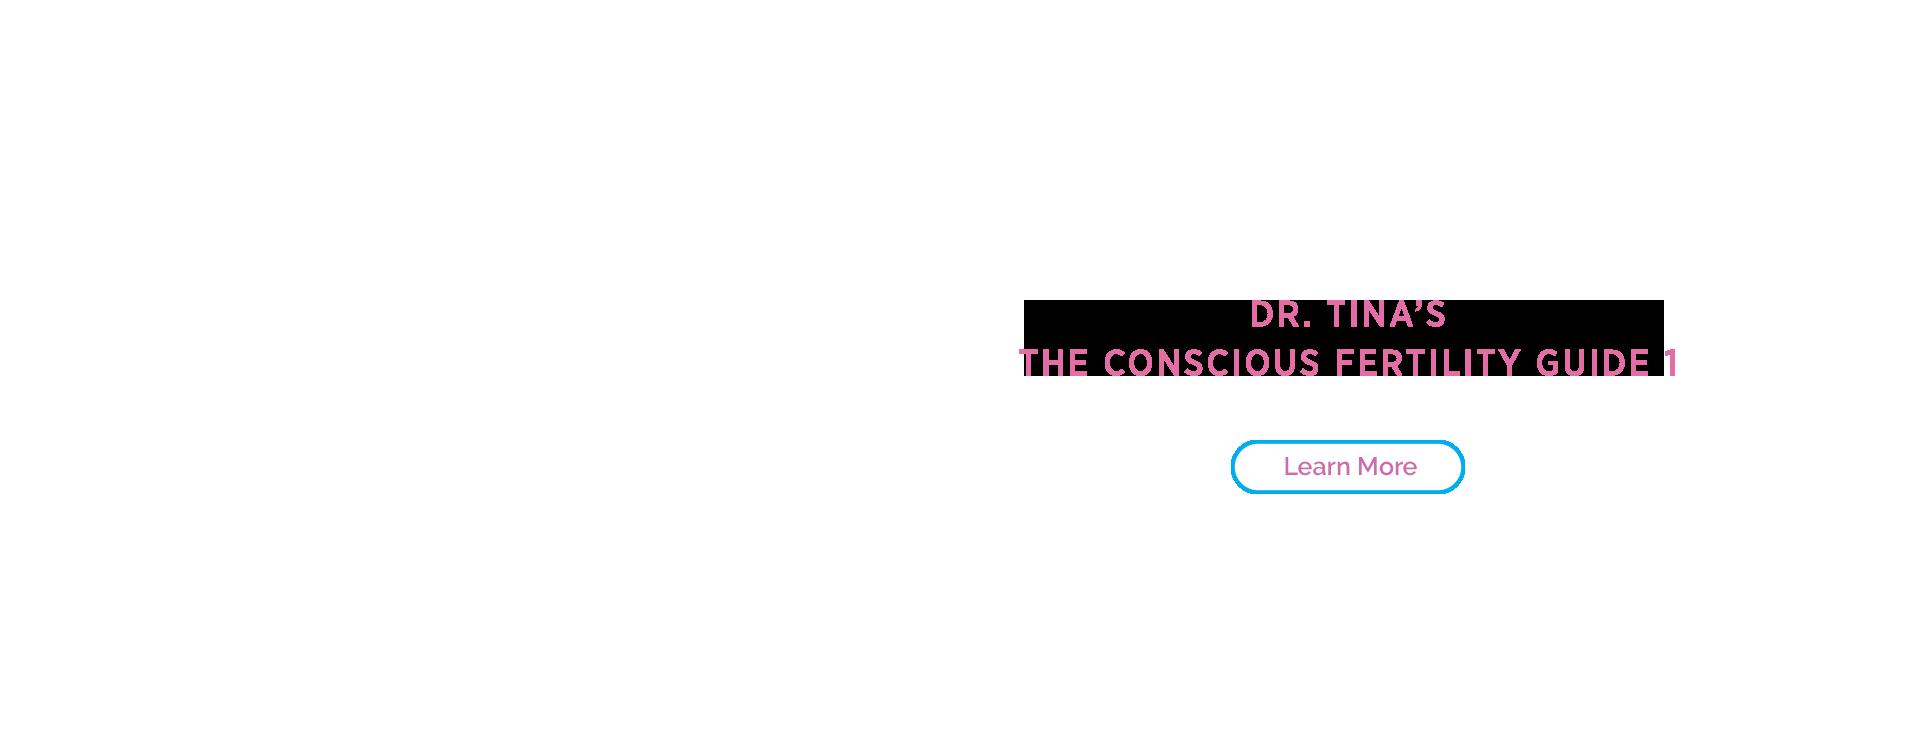 , Conscious Fertility Guide 2020